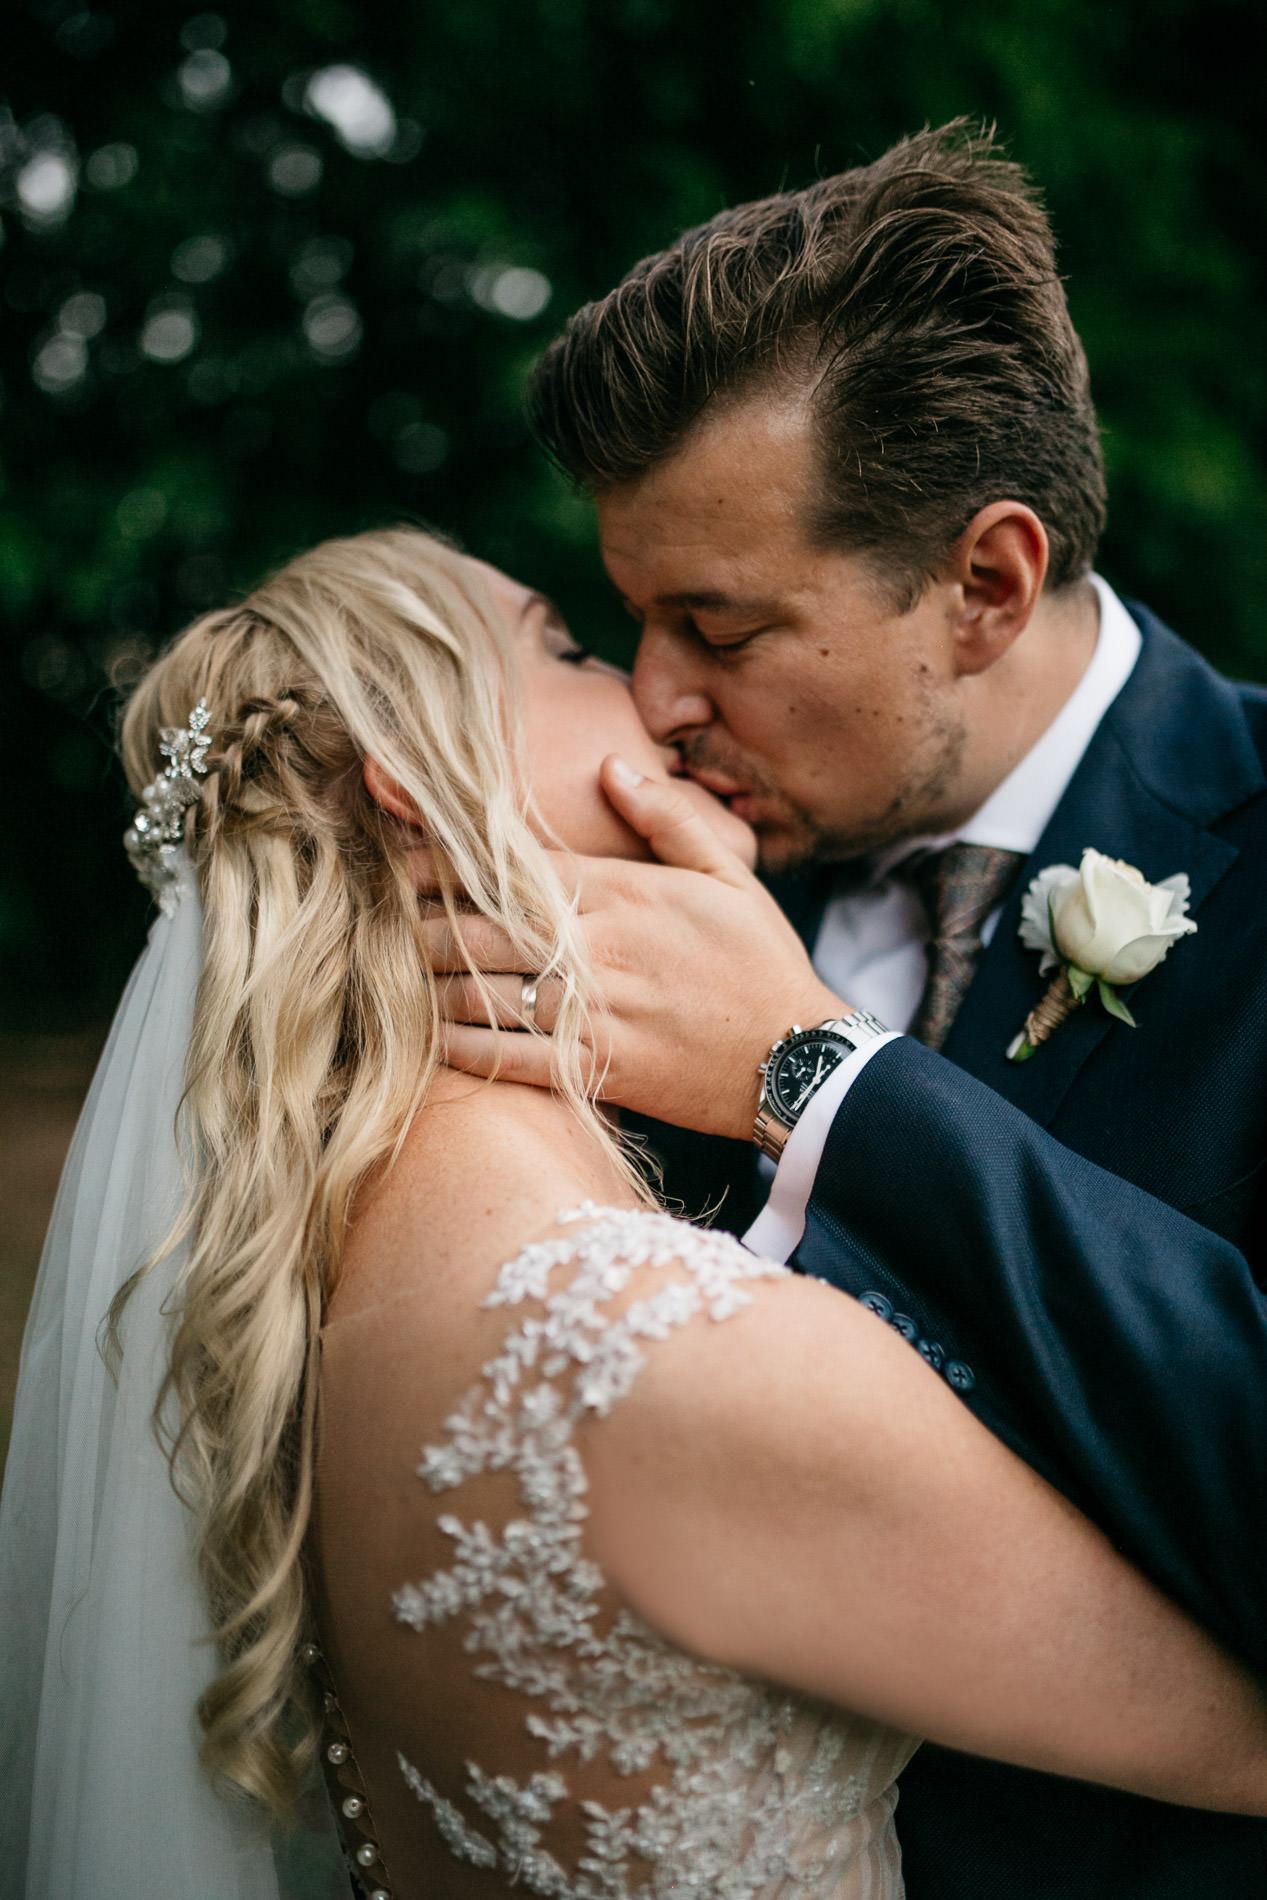 True North Photography_Boomerang Farm_Stacey and Isaac_Gold Coast Wedding_Barm Wedding_Hinterland Wedding-163.jpg